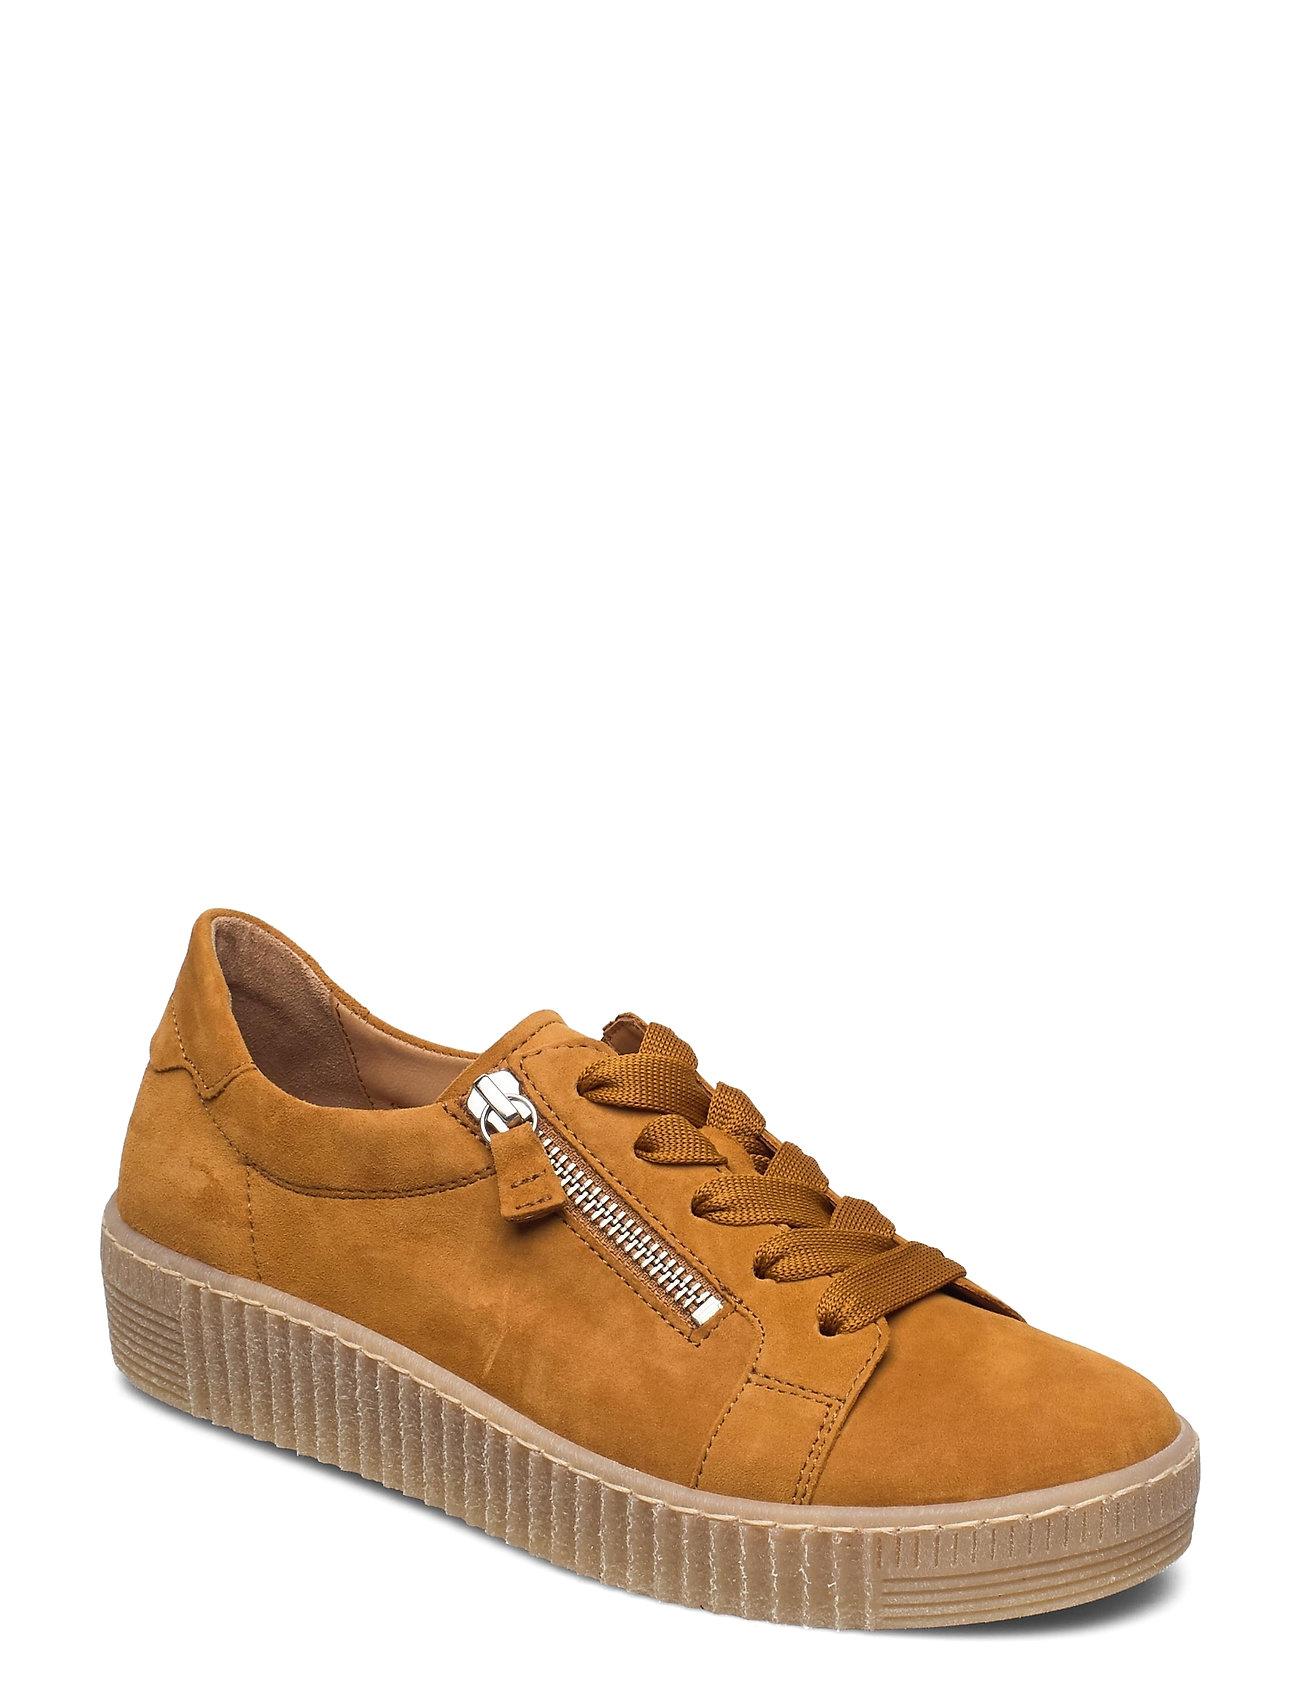 Image of Sneaker Low-top Sneakers Gul Gabor (3462700099)